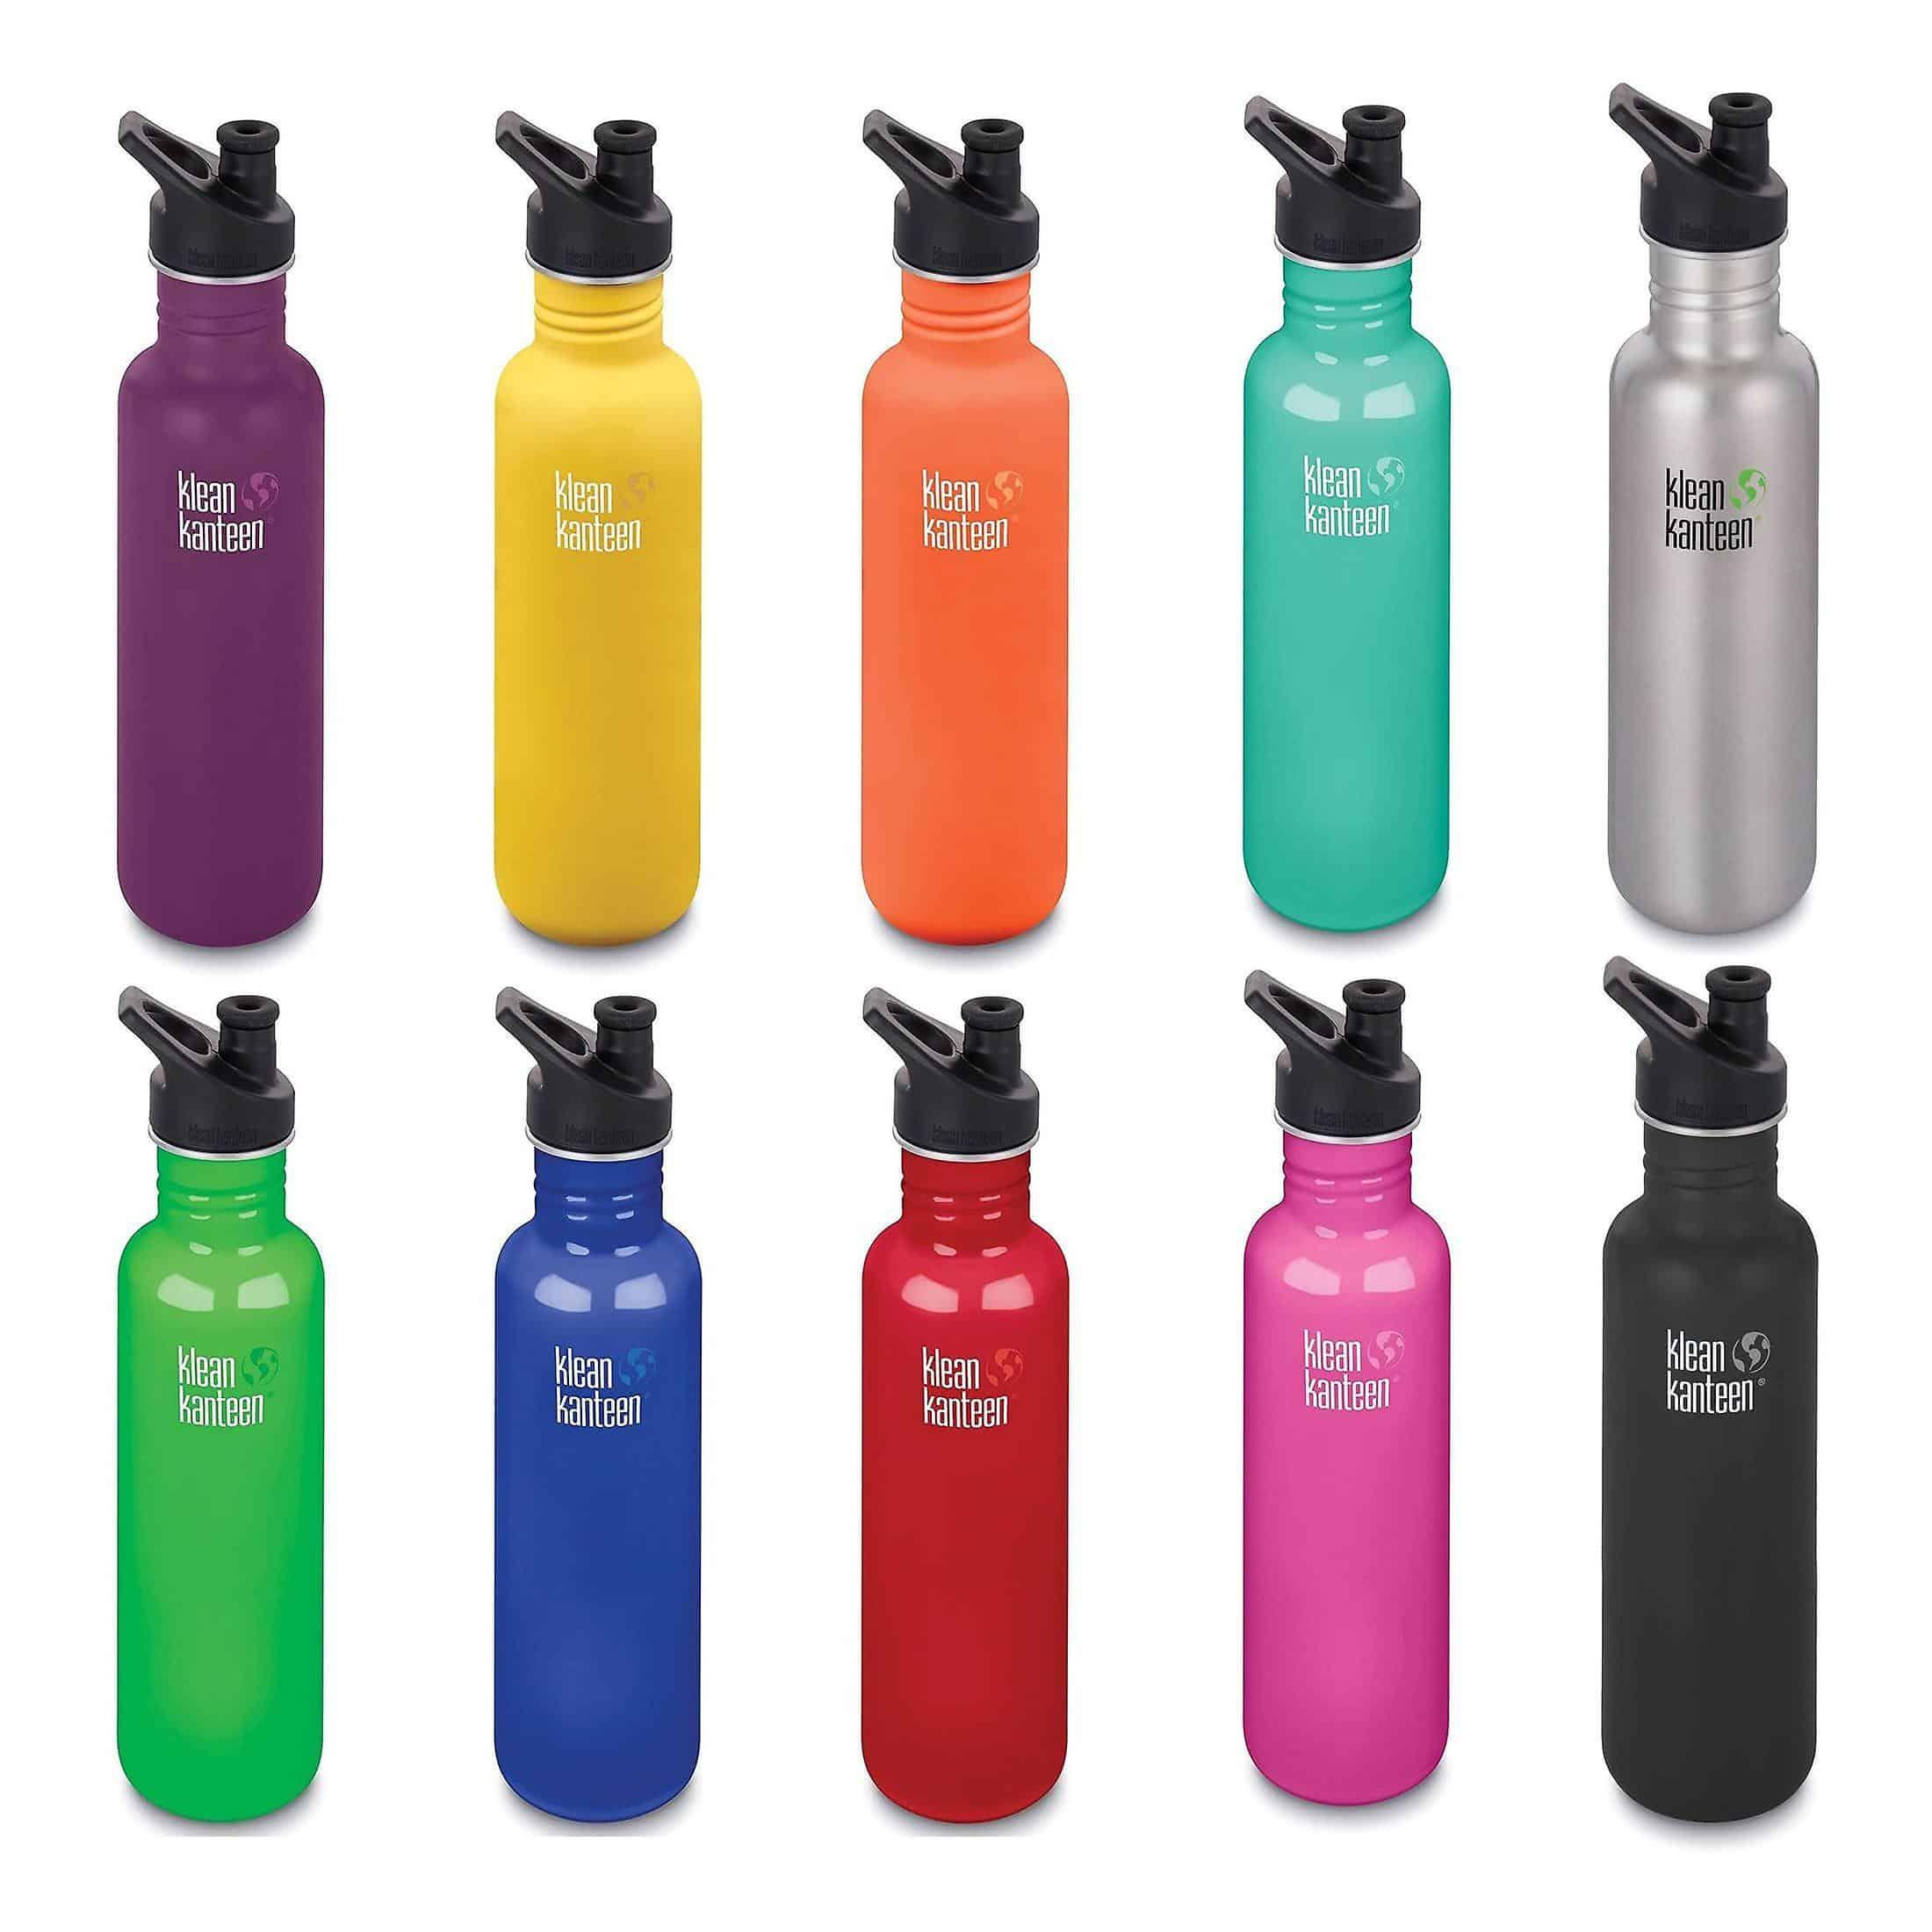 Klean Kanteen 27 oz water bottle from gimme the good stuff